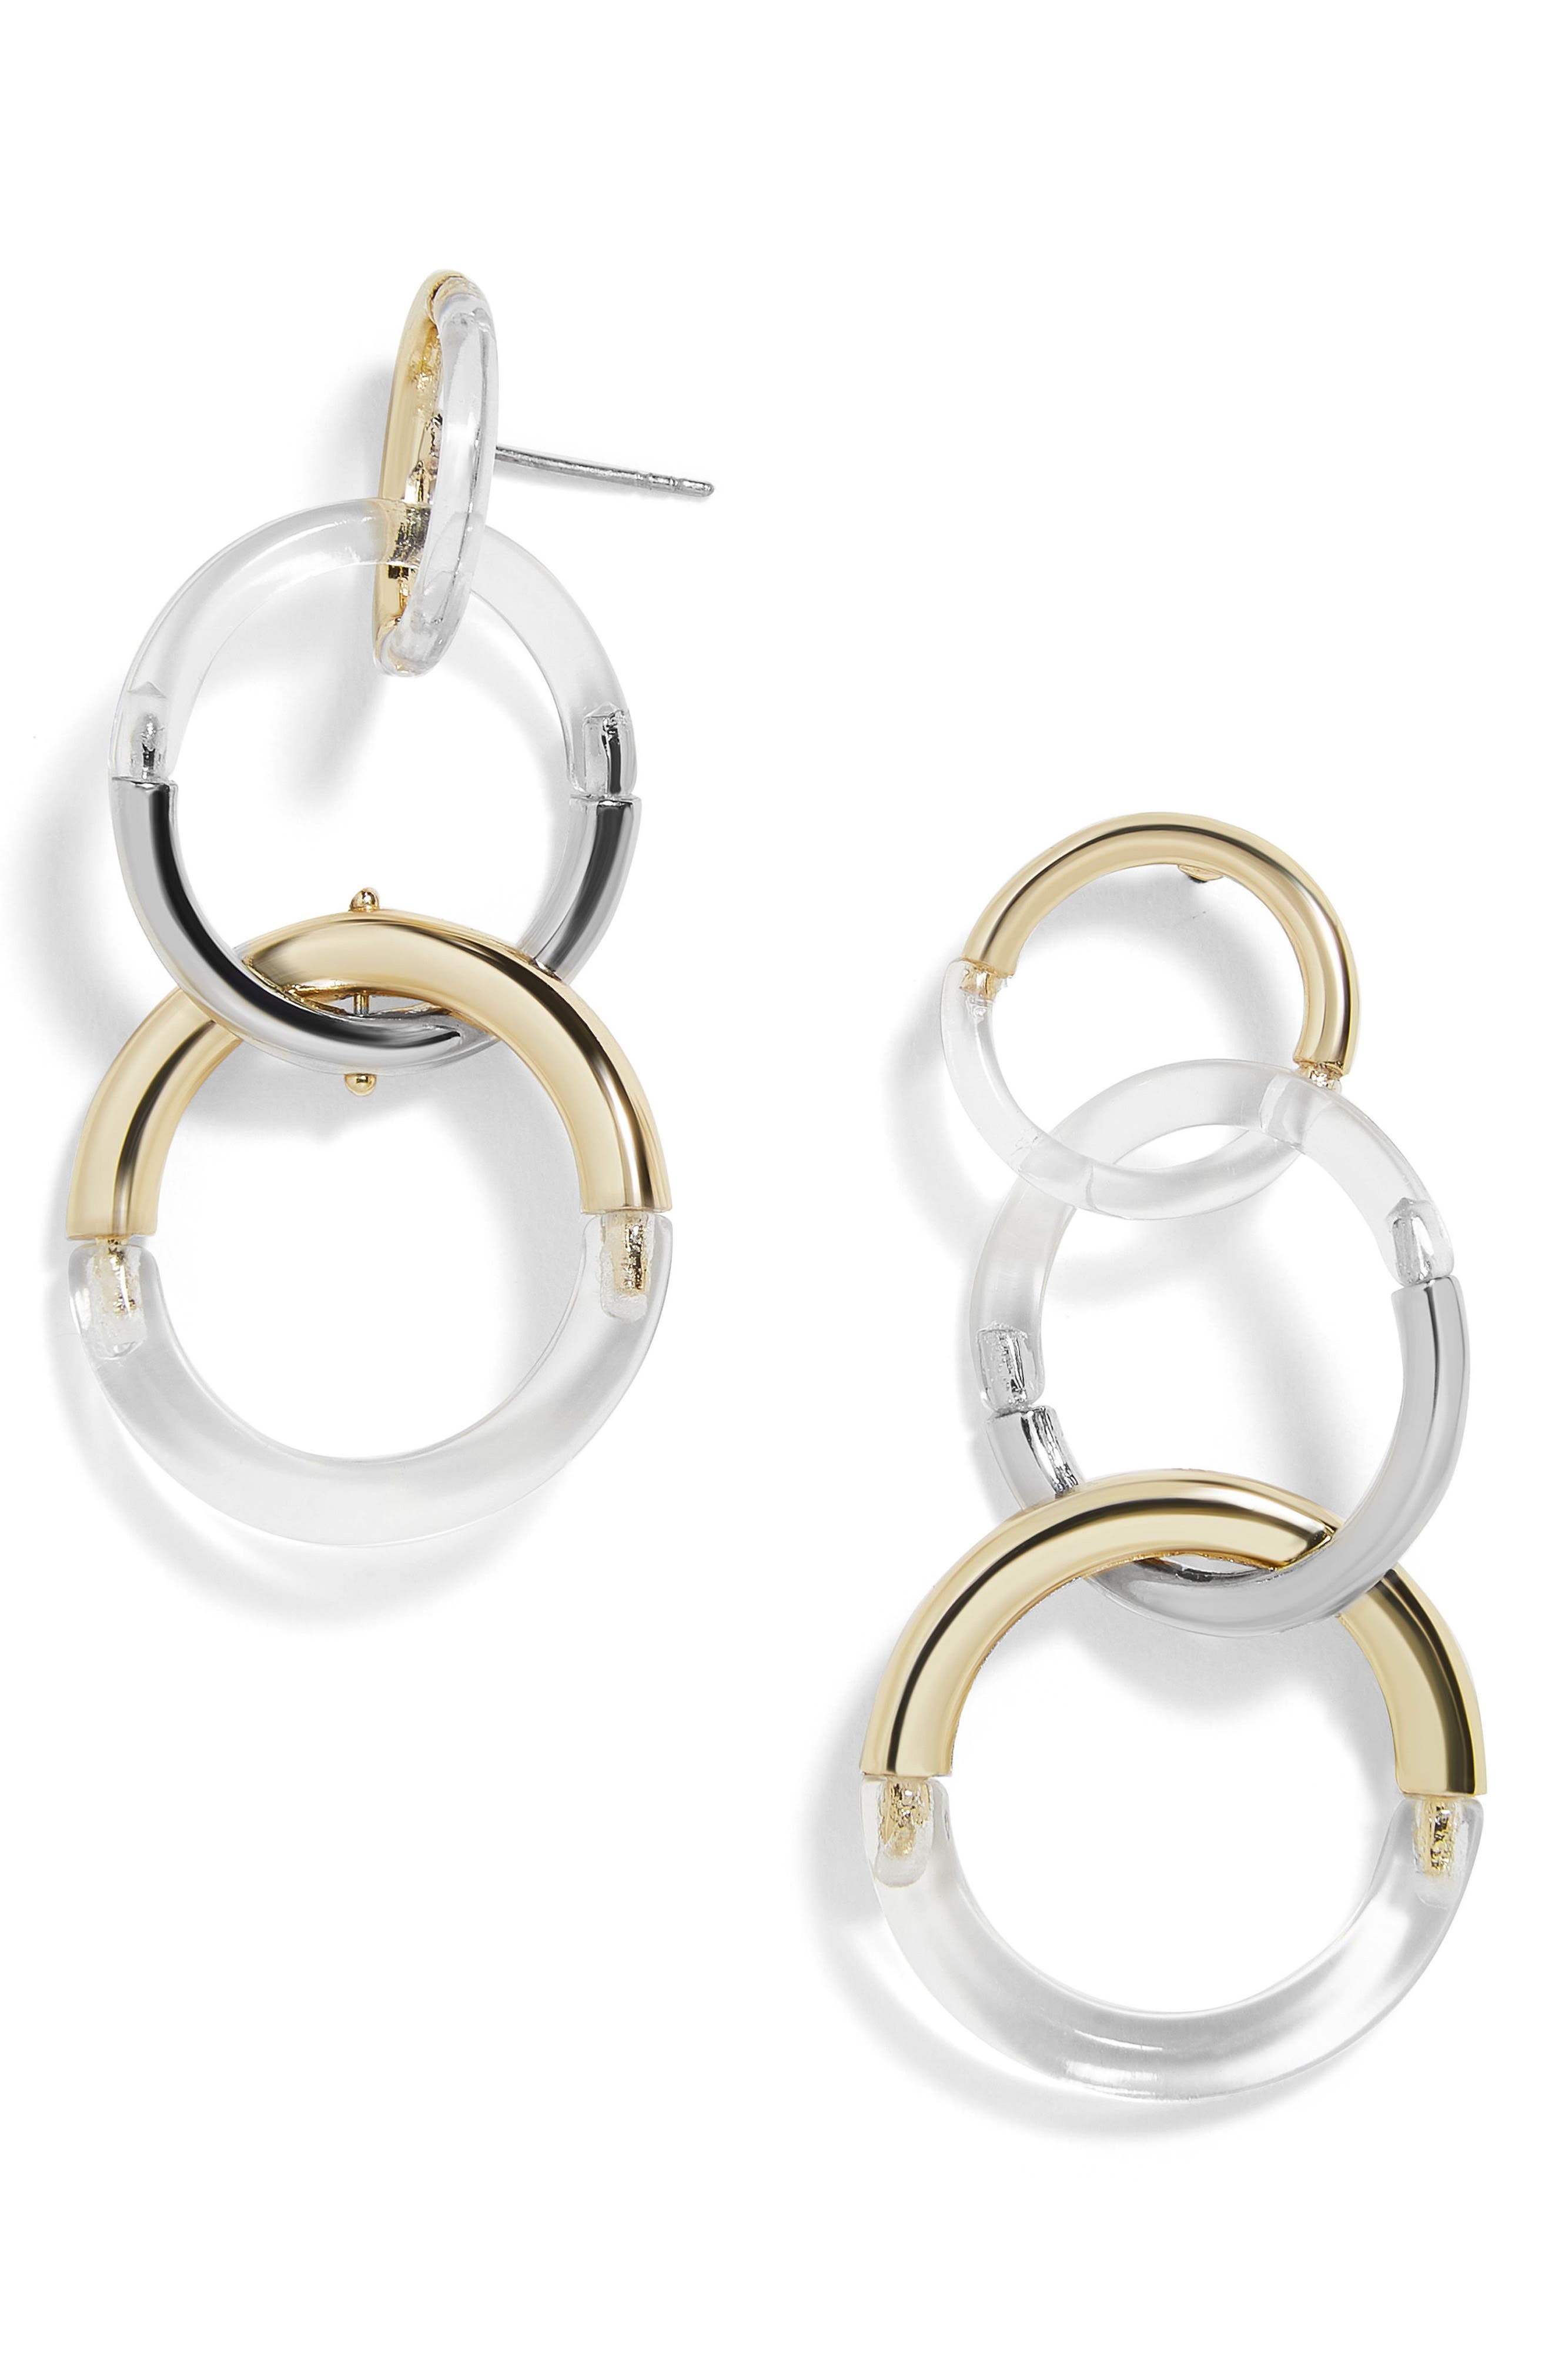 Lova Drop Earrings,                         Main,                         color, GOLD